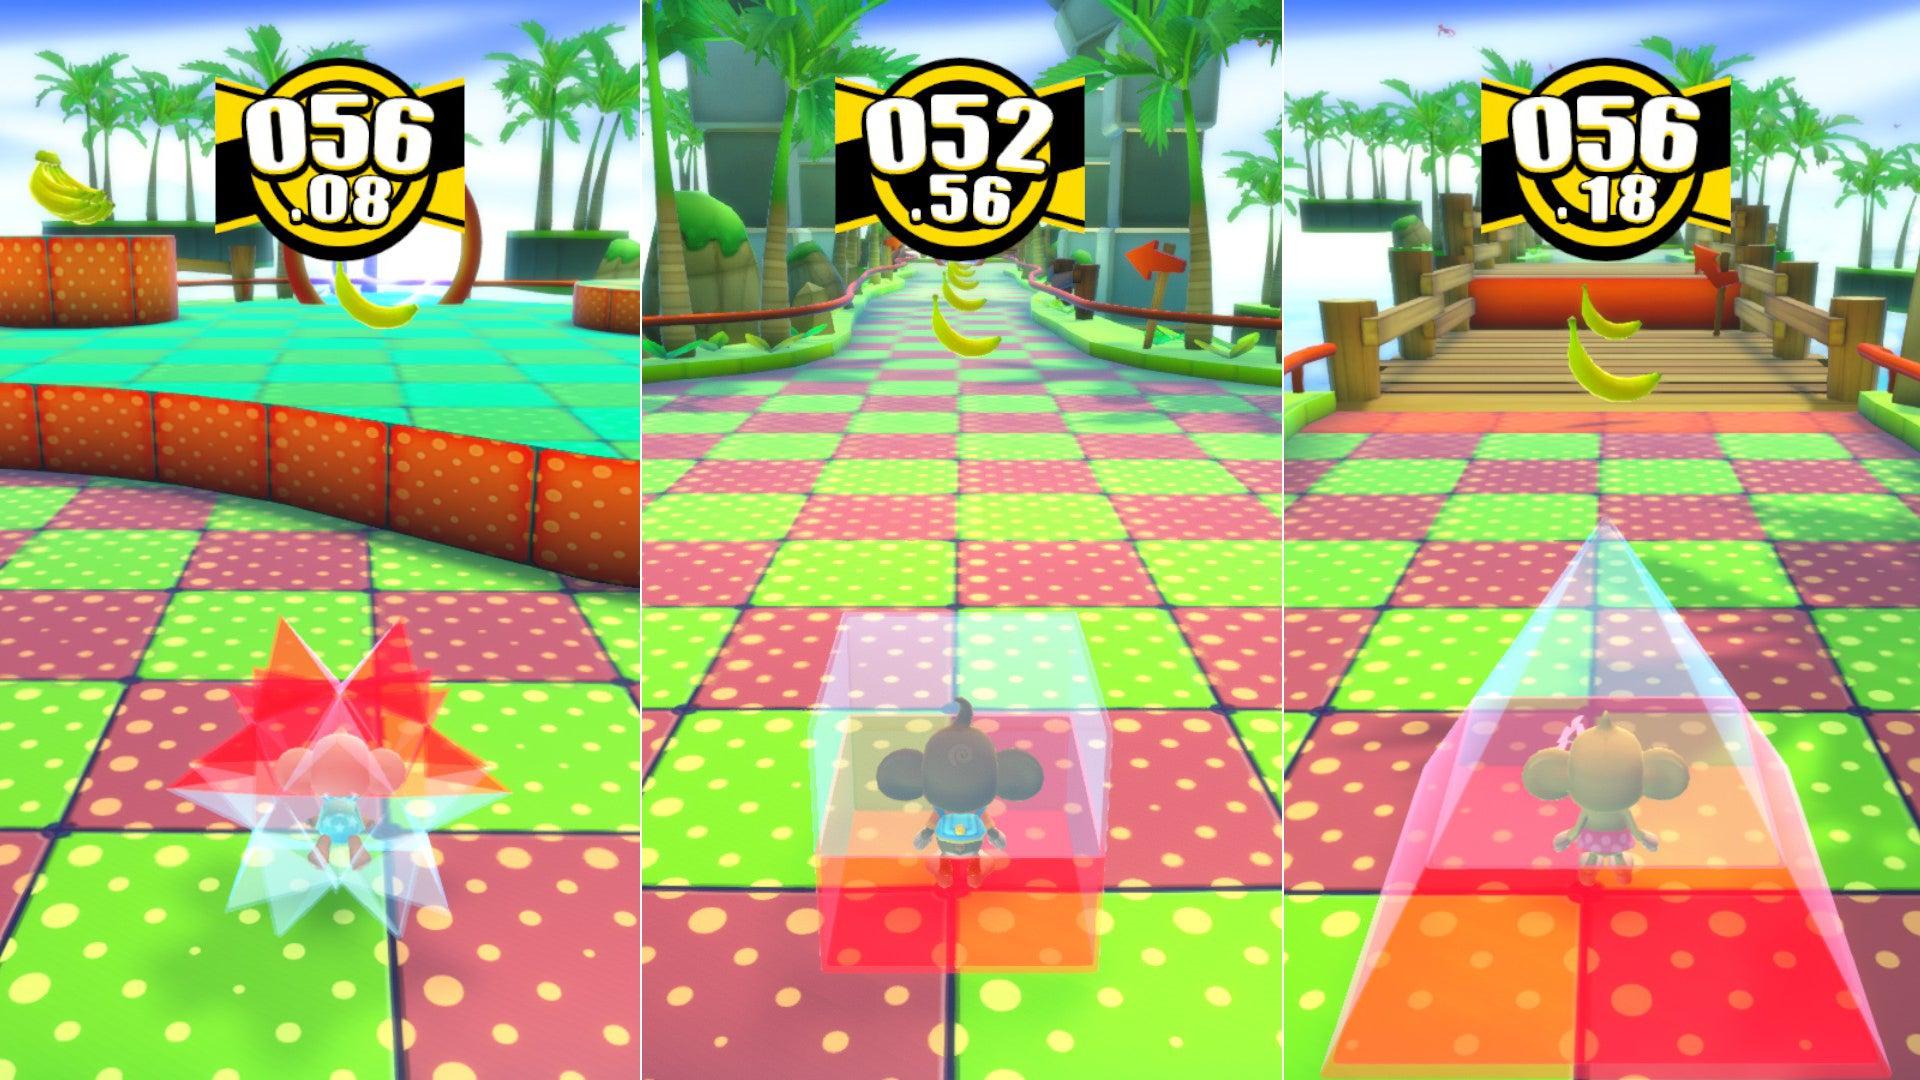 Code Turns Super Monkey Ball PC Into Super Monkey Cube